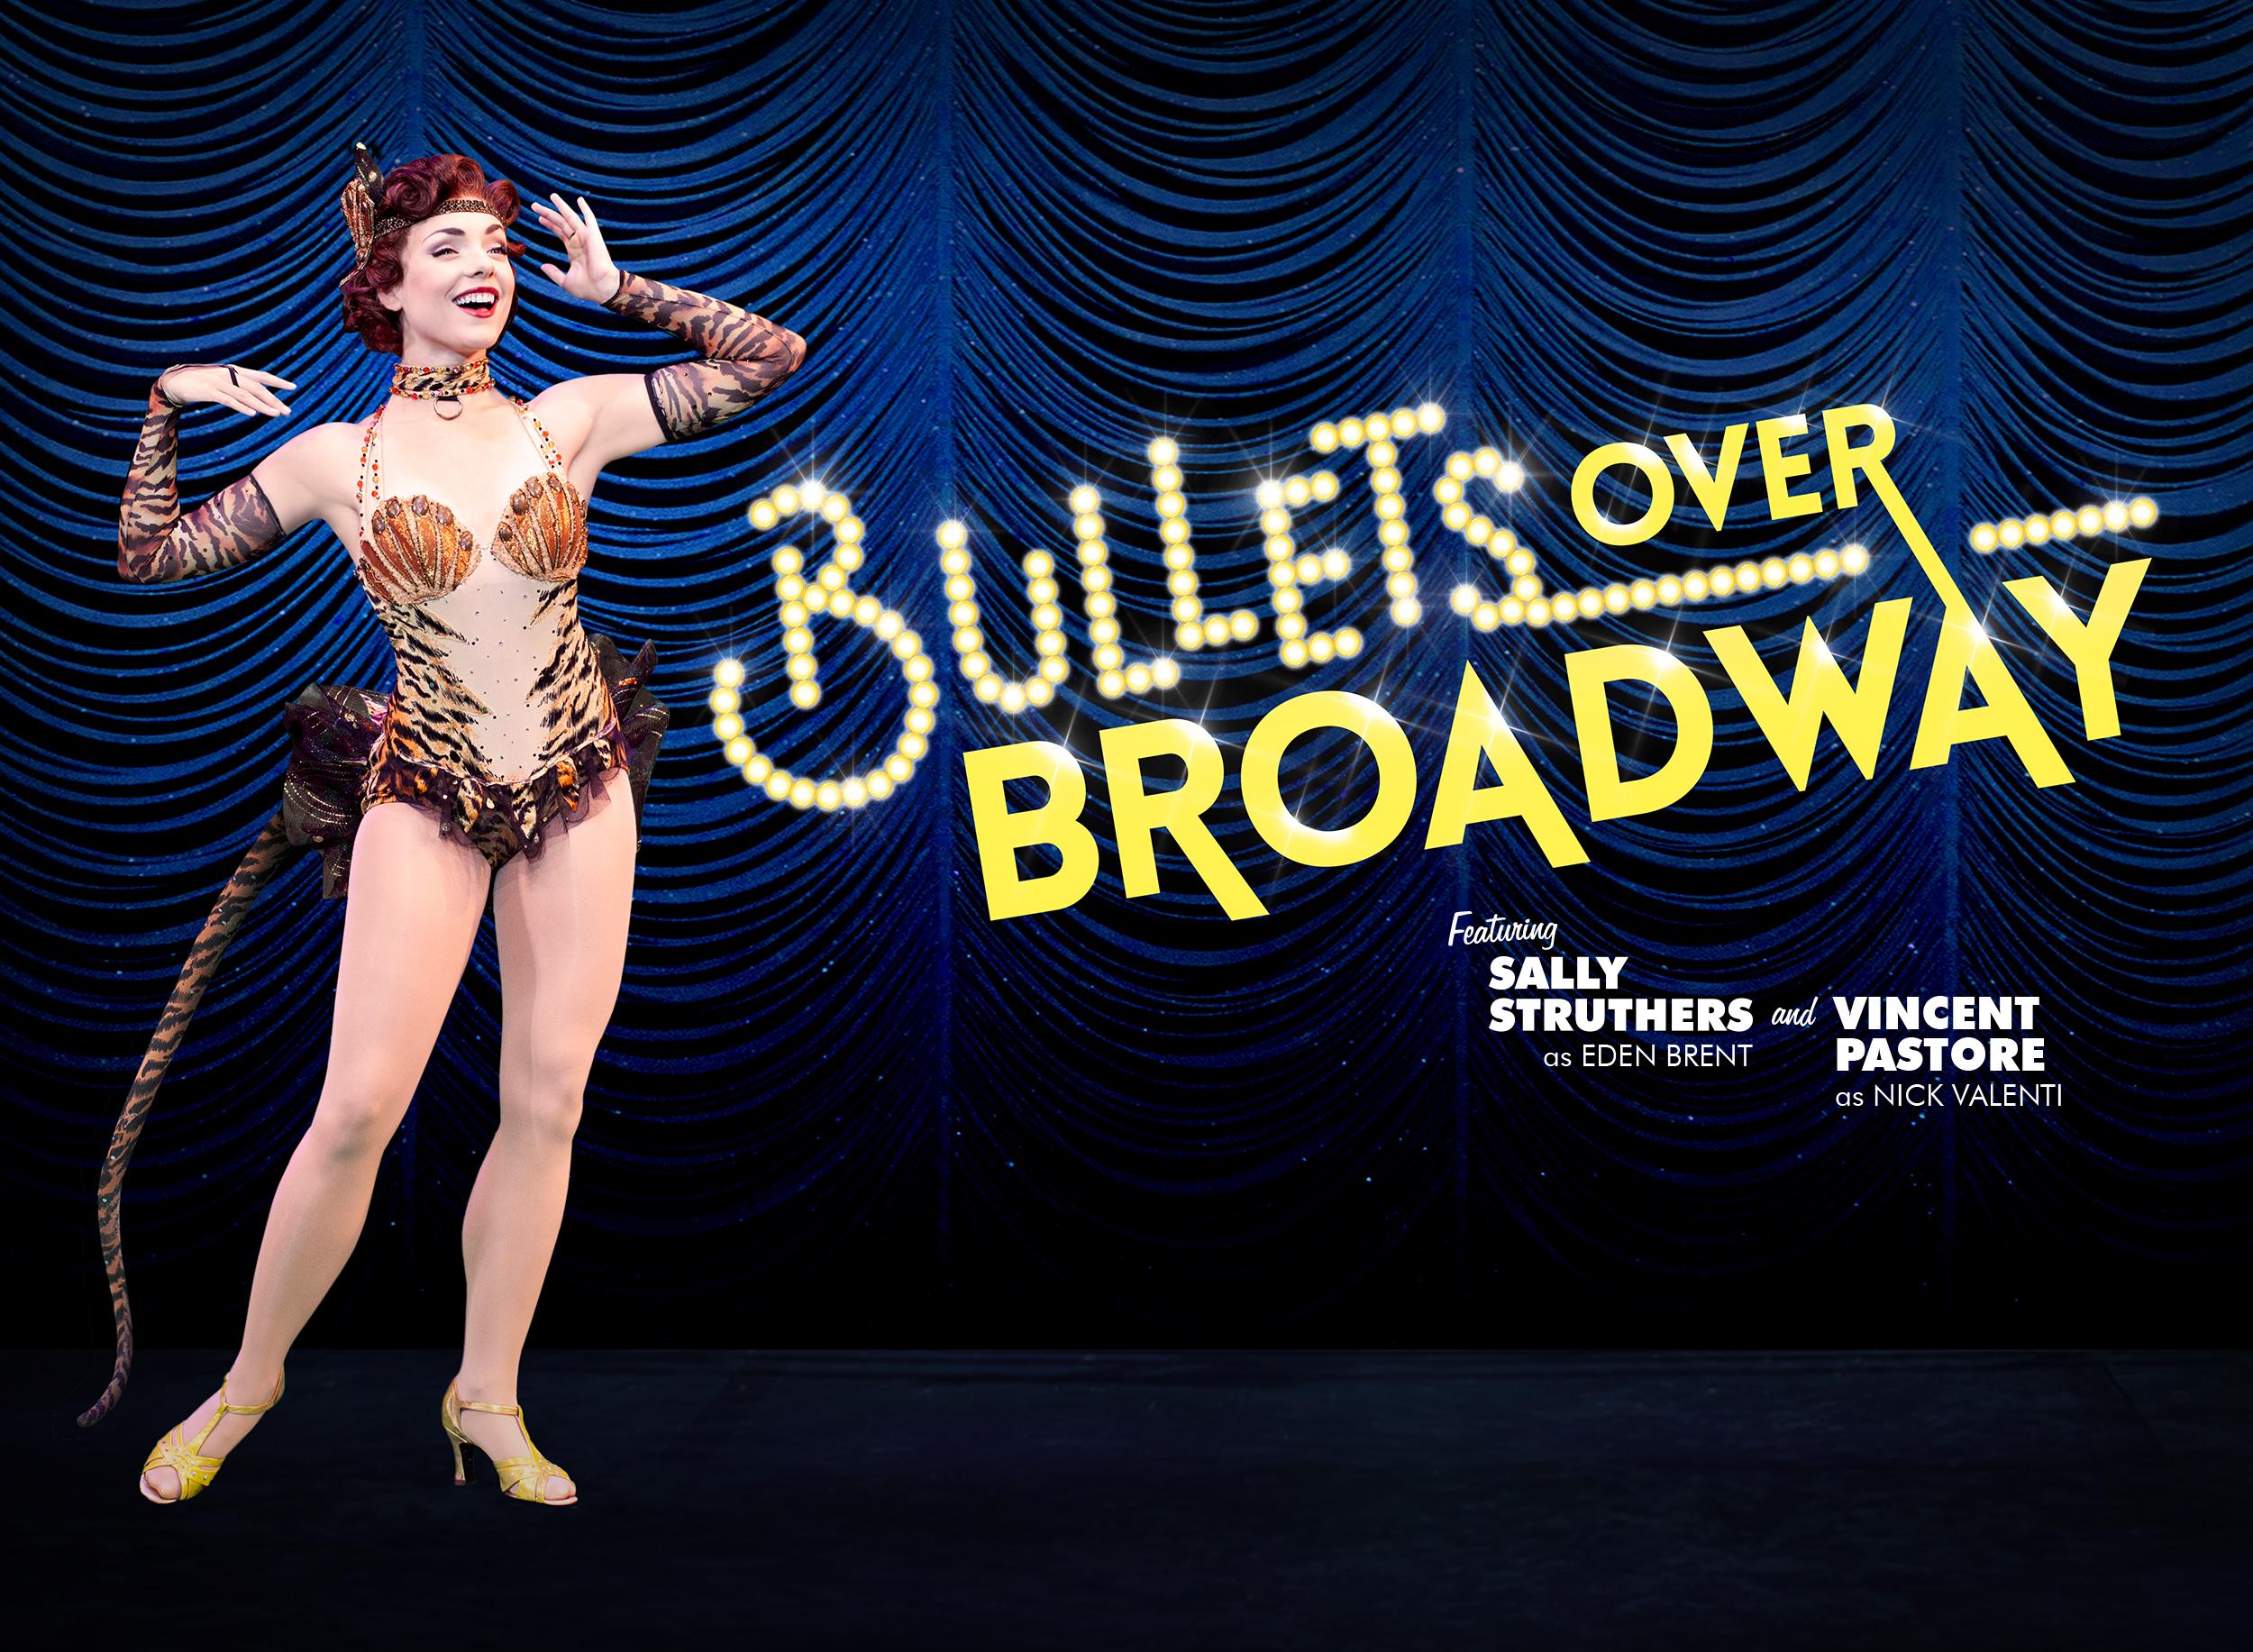 2017_bullets-over-broadway_header_3.jpg